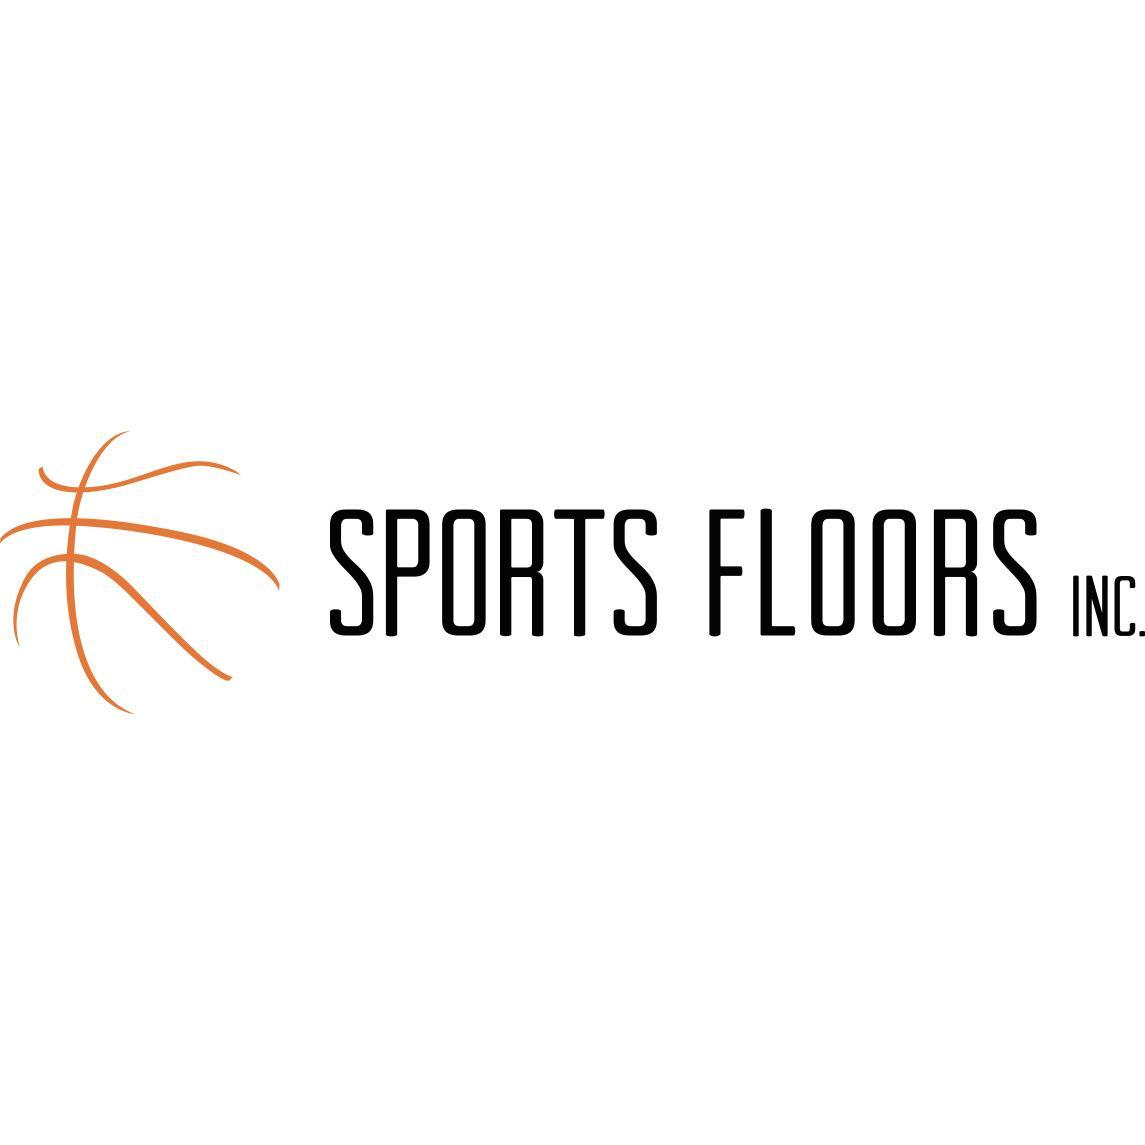 Sports Floors, Inc.